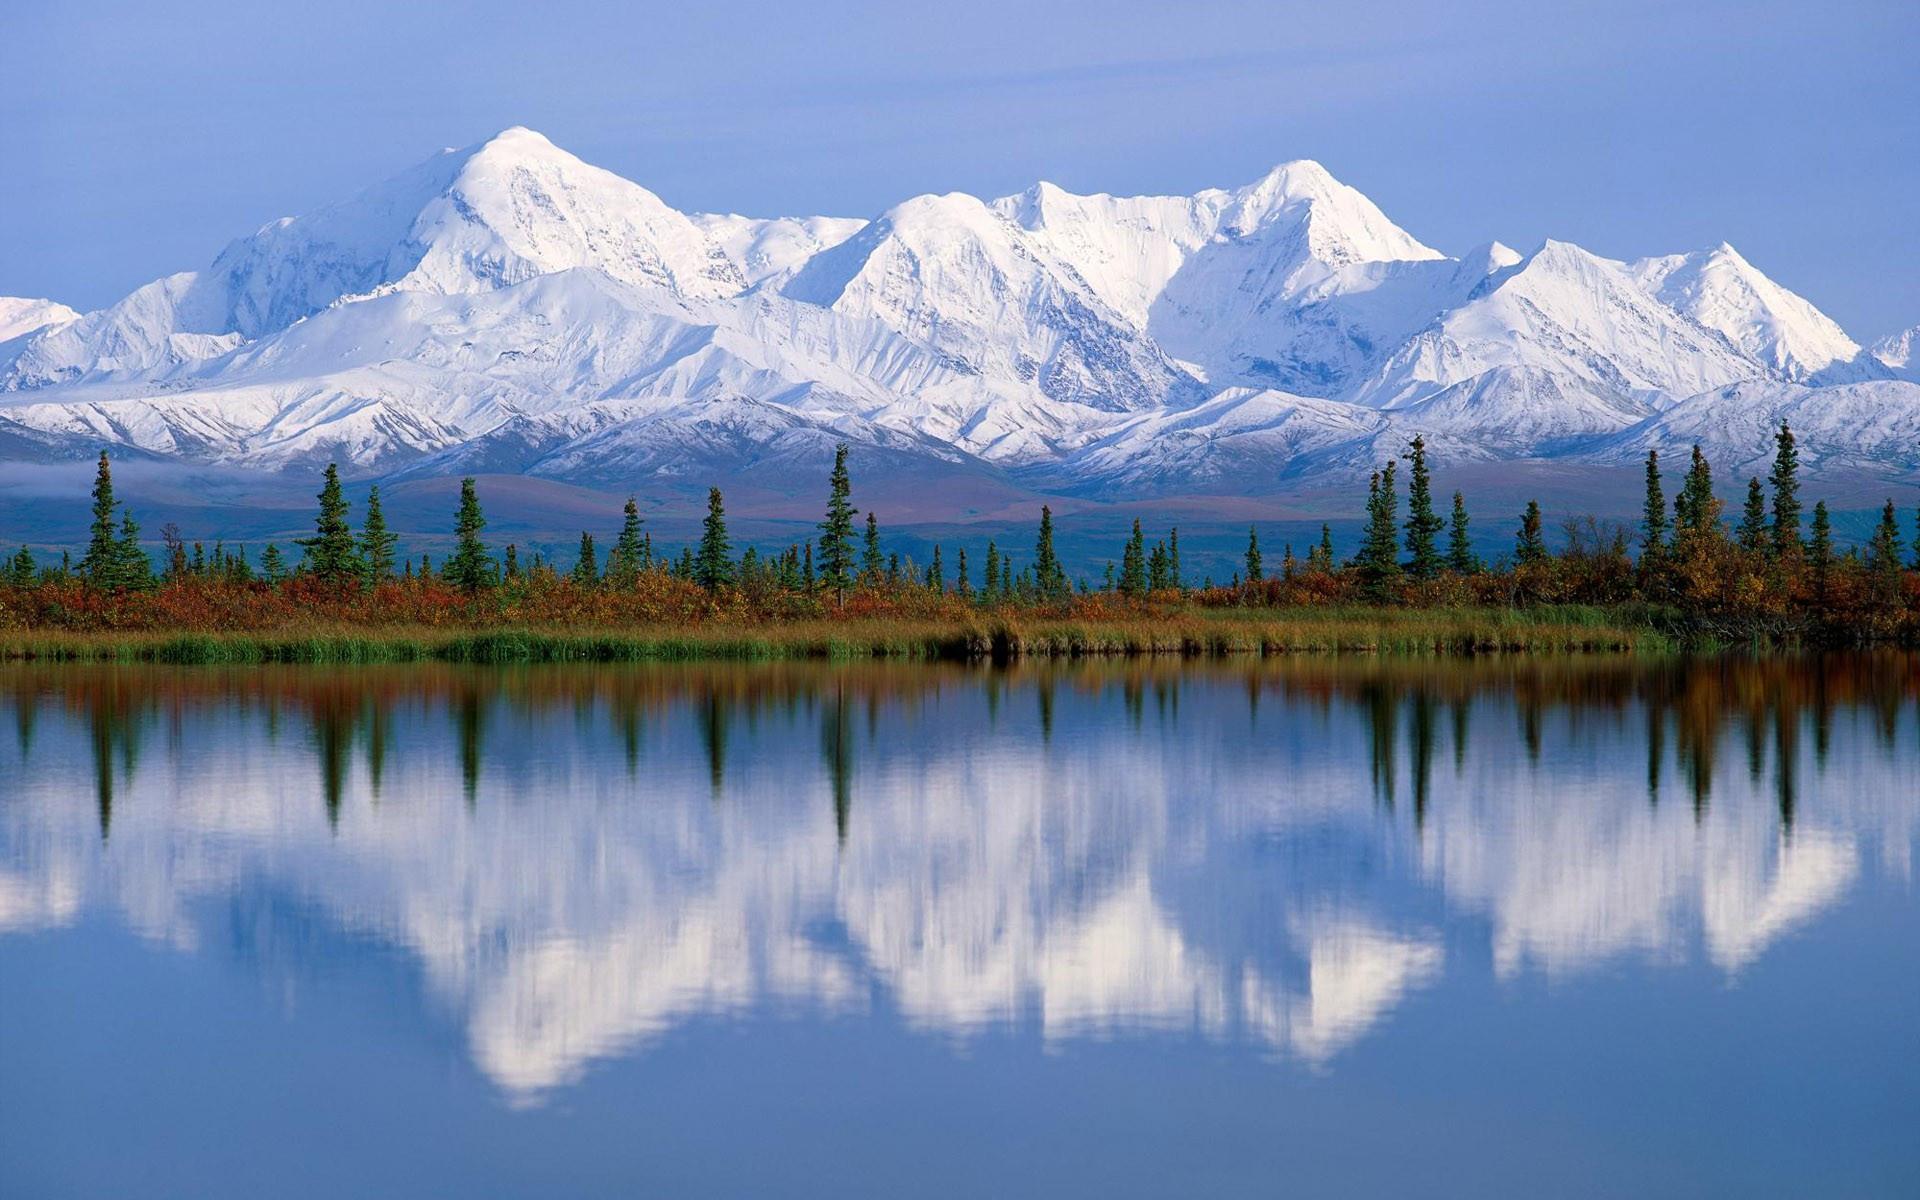 Borough Alaska Wallpaper 1680x1050 Beautiful Scenery Photography 1920x1200